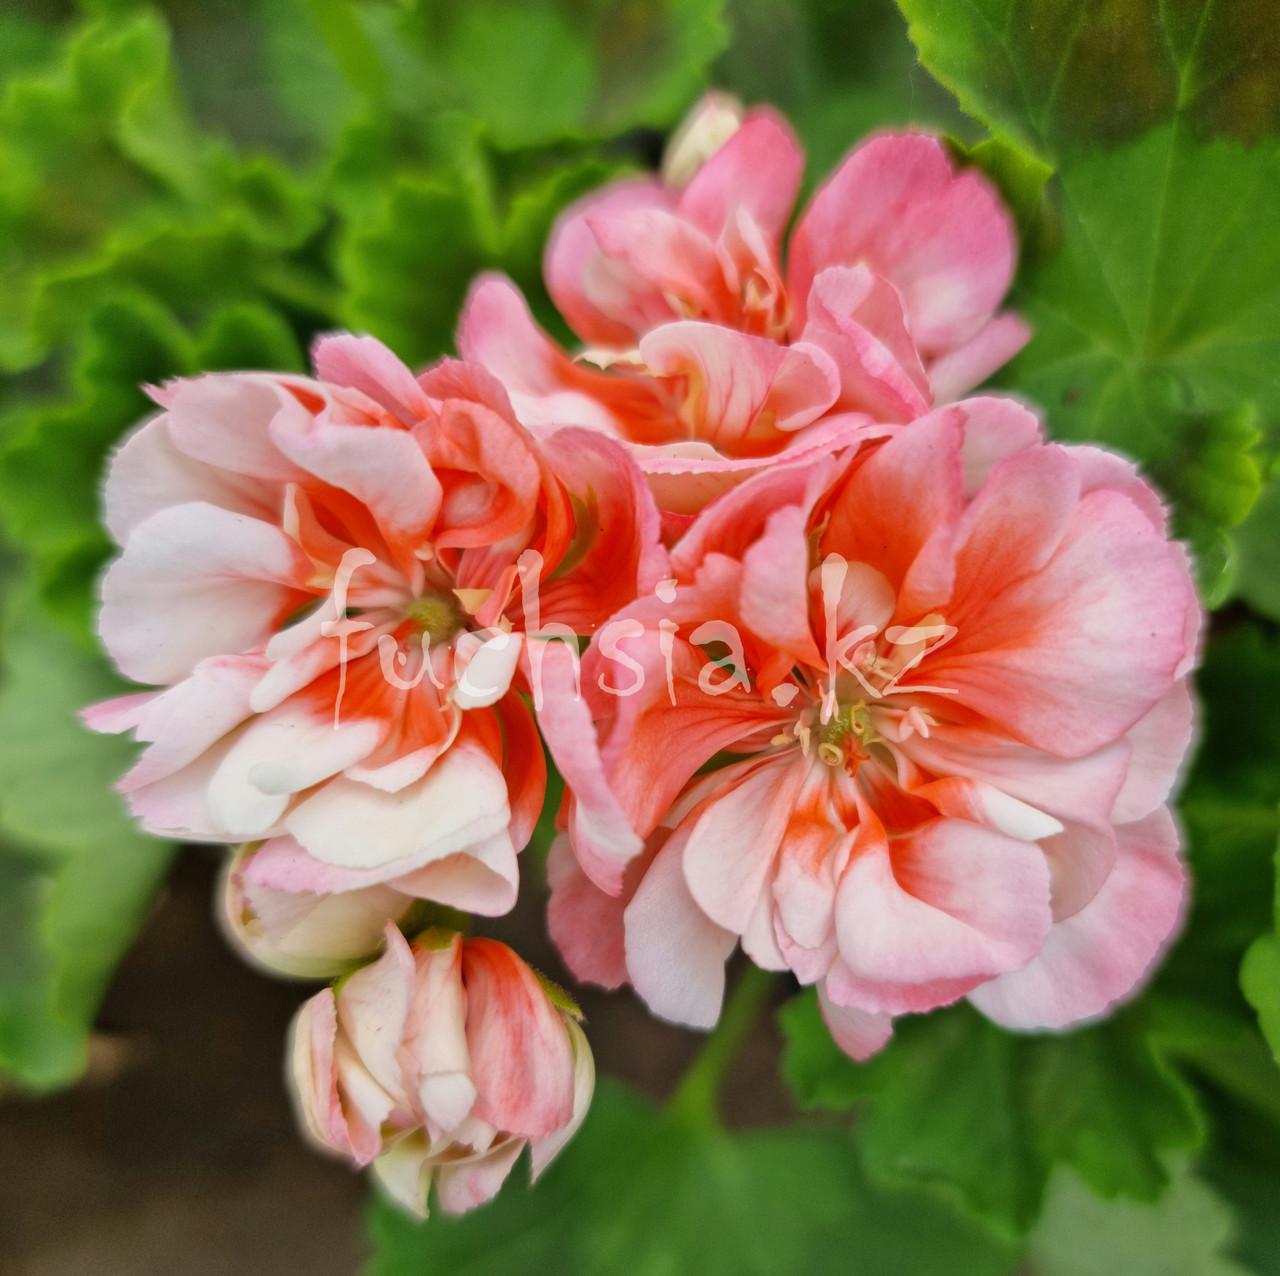 Grandeur Deco Apple Blossom / укор.черенок